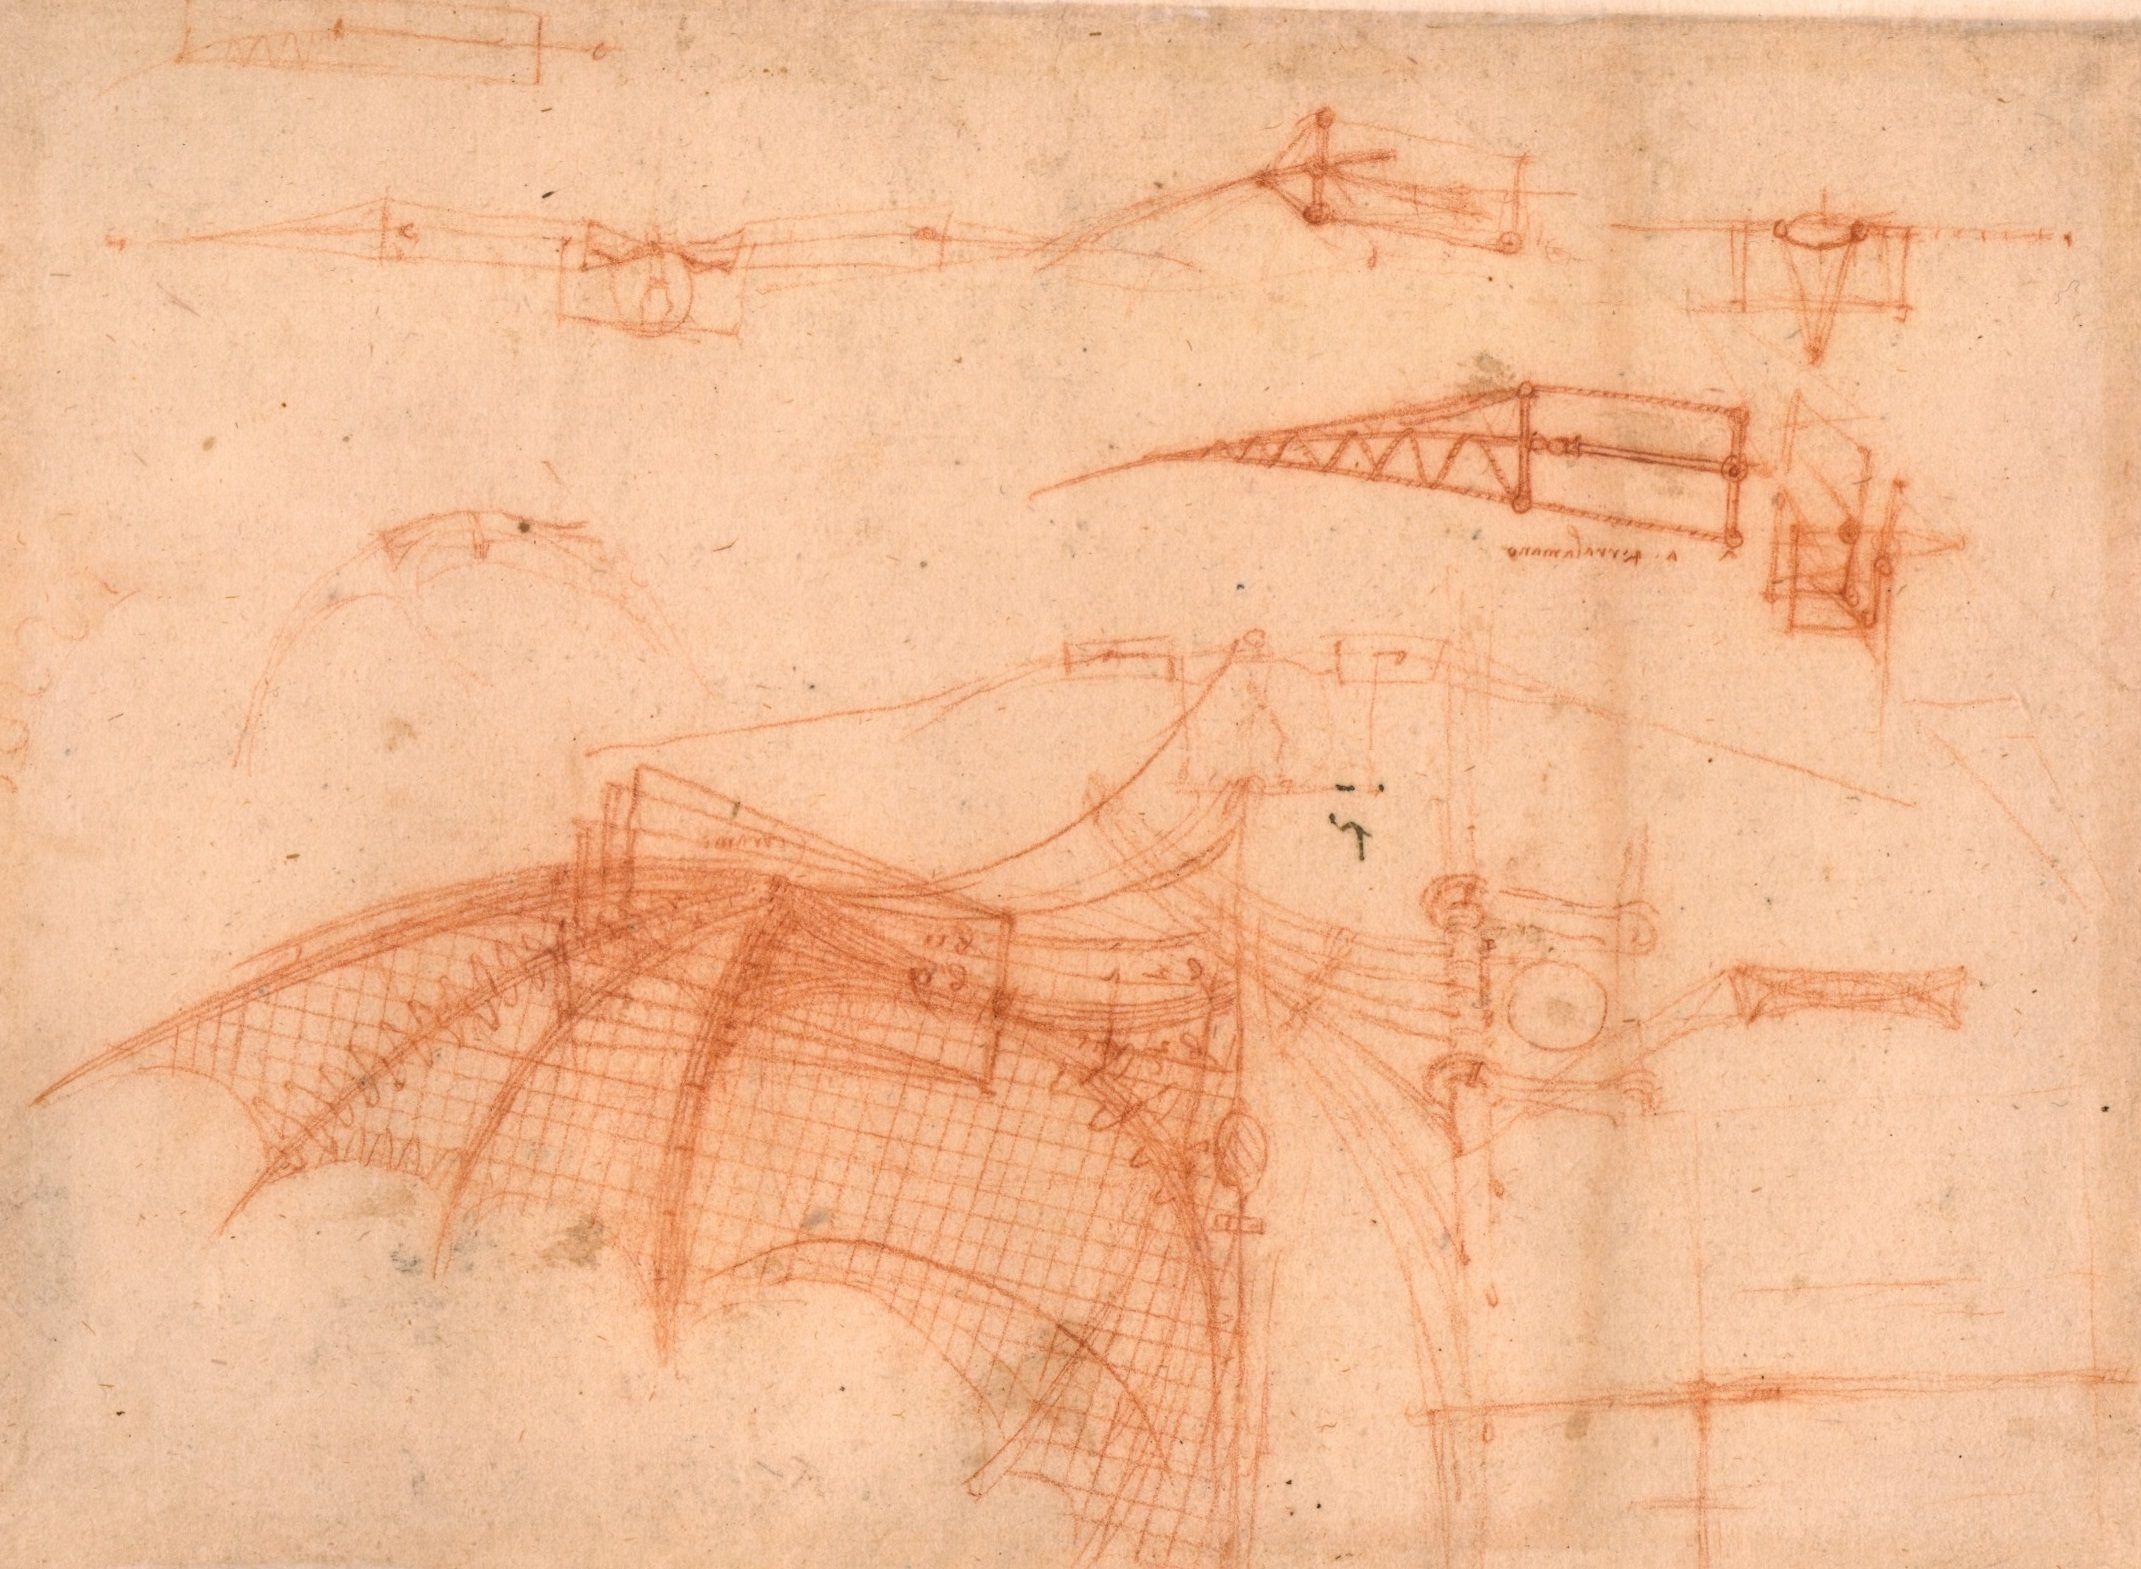 Contour Line Drawing Leonardo Da Vinci : Drawing of a mechanical wing by leonardo da vinci circa